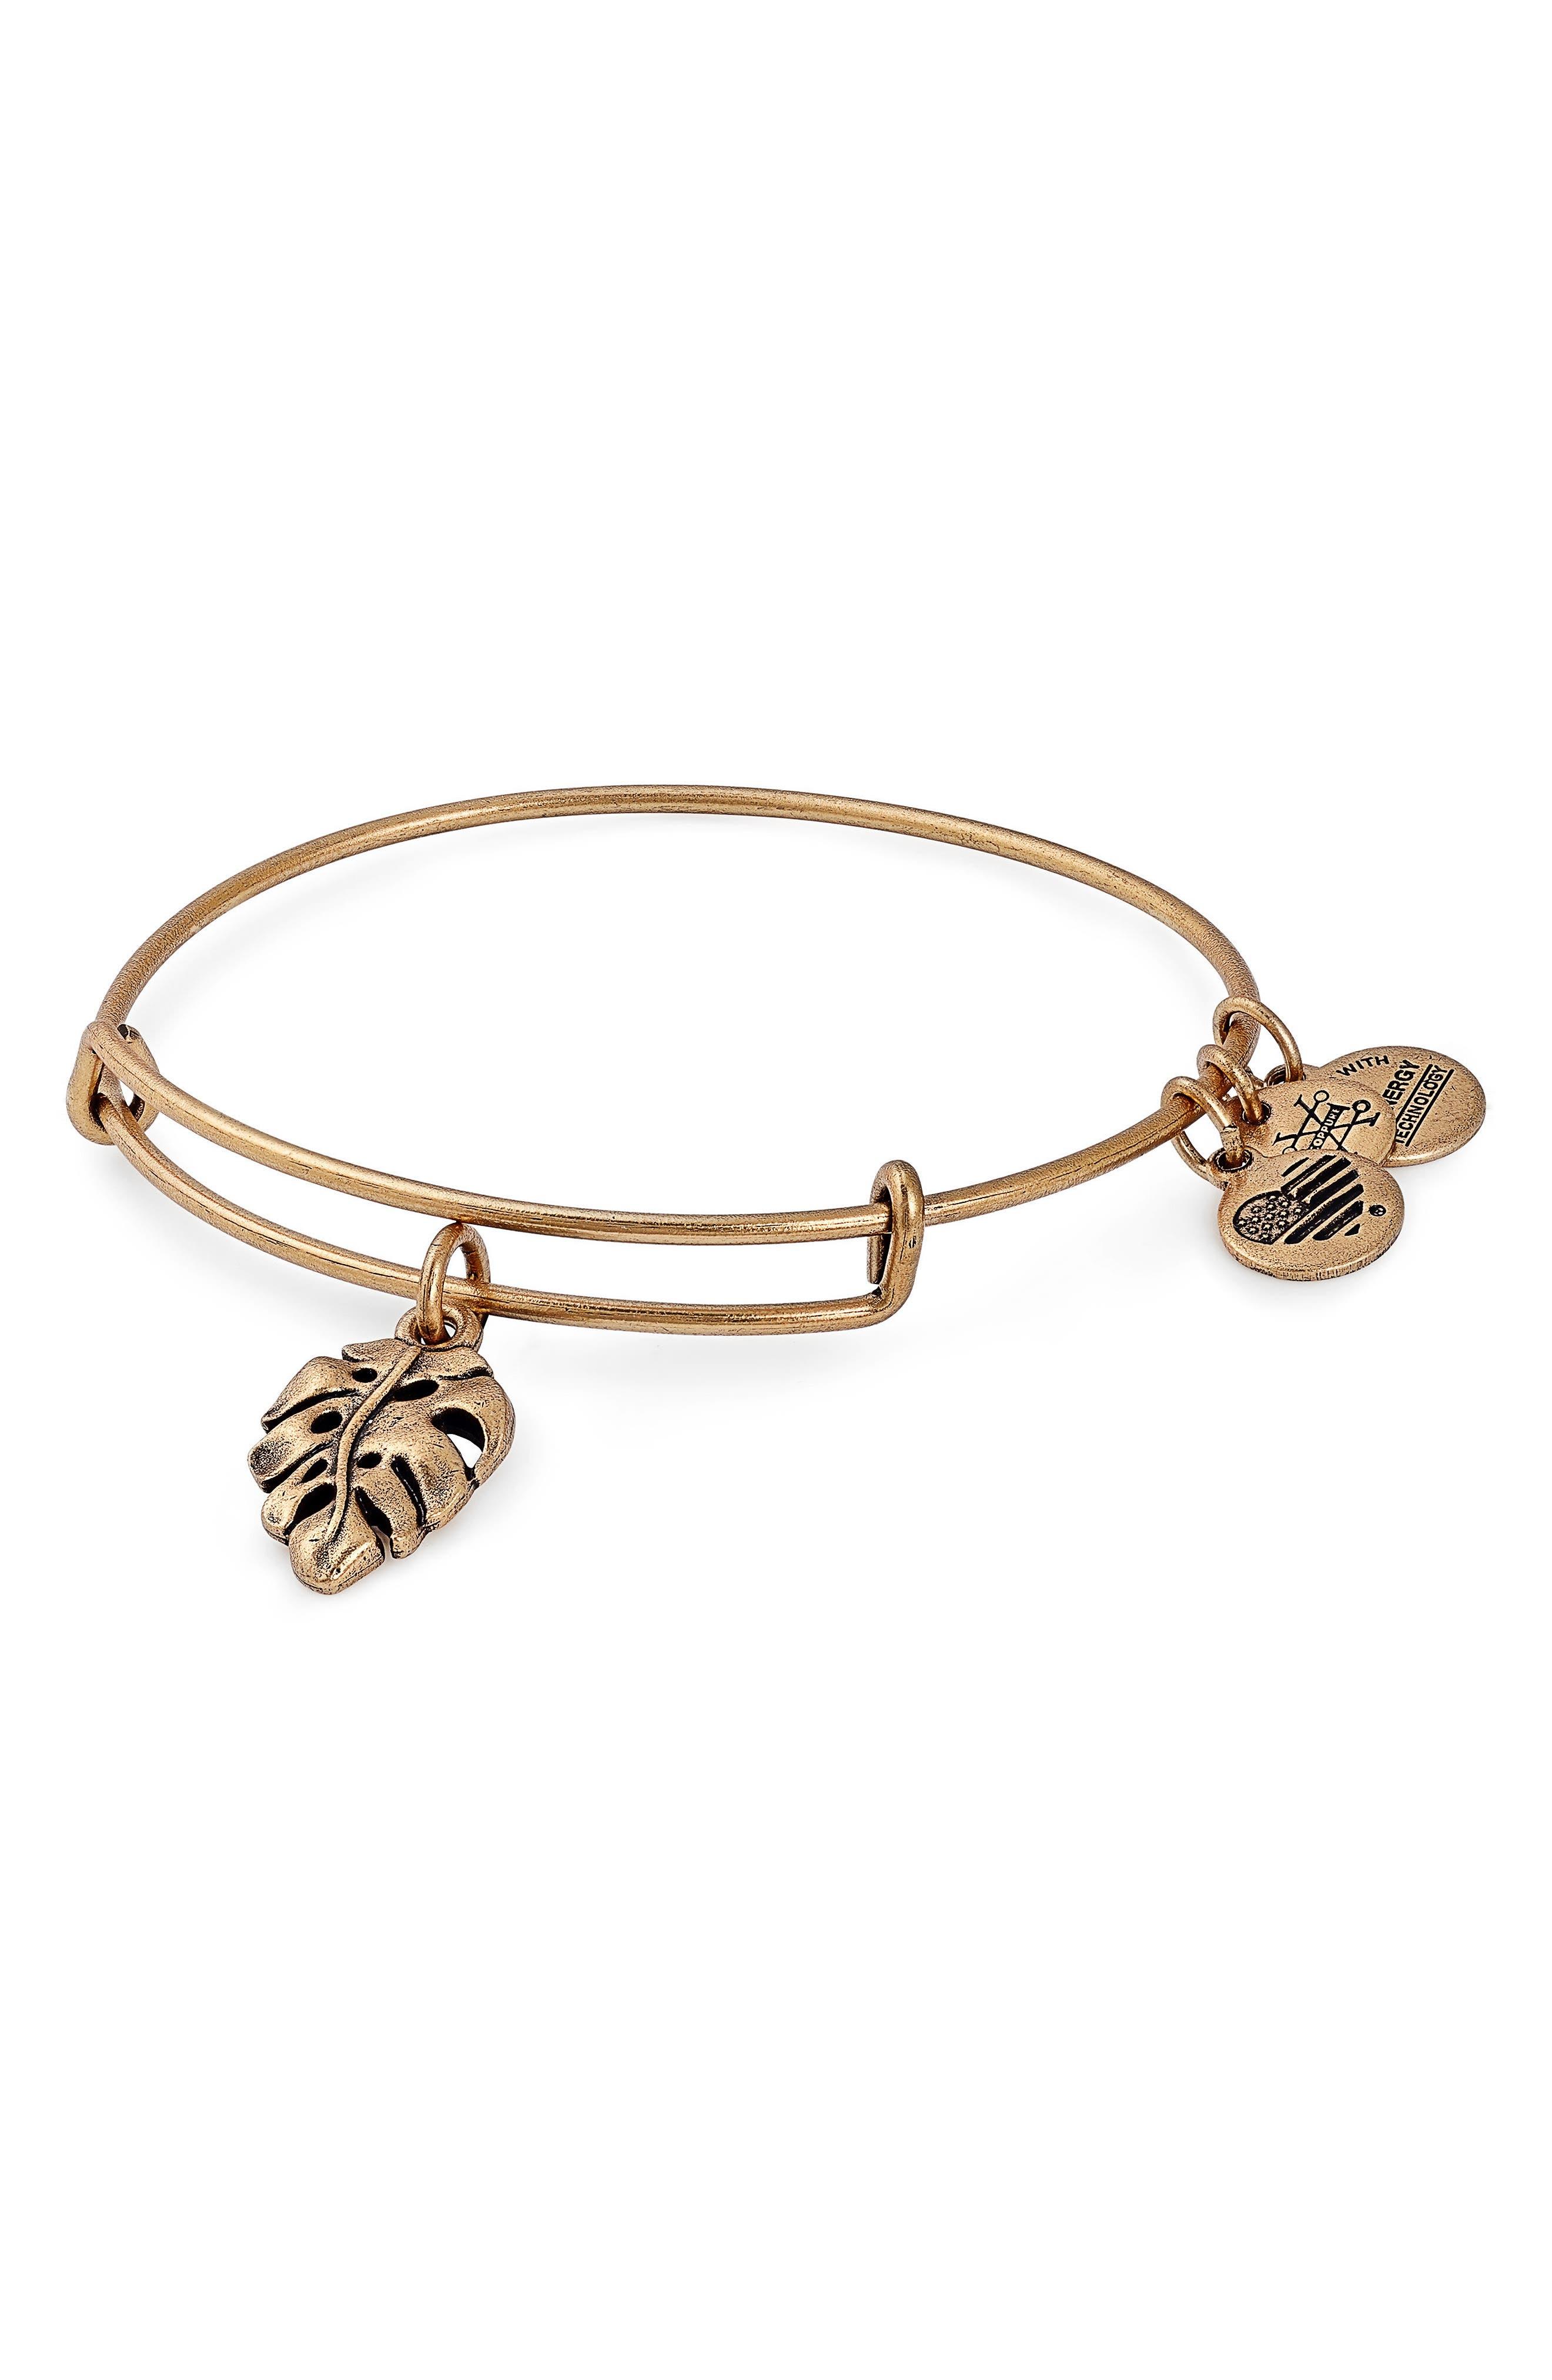 Alex and Ani Palm Leaf Charm Bracelet